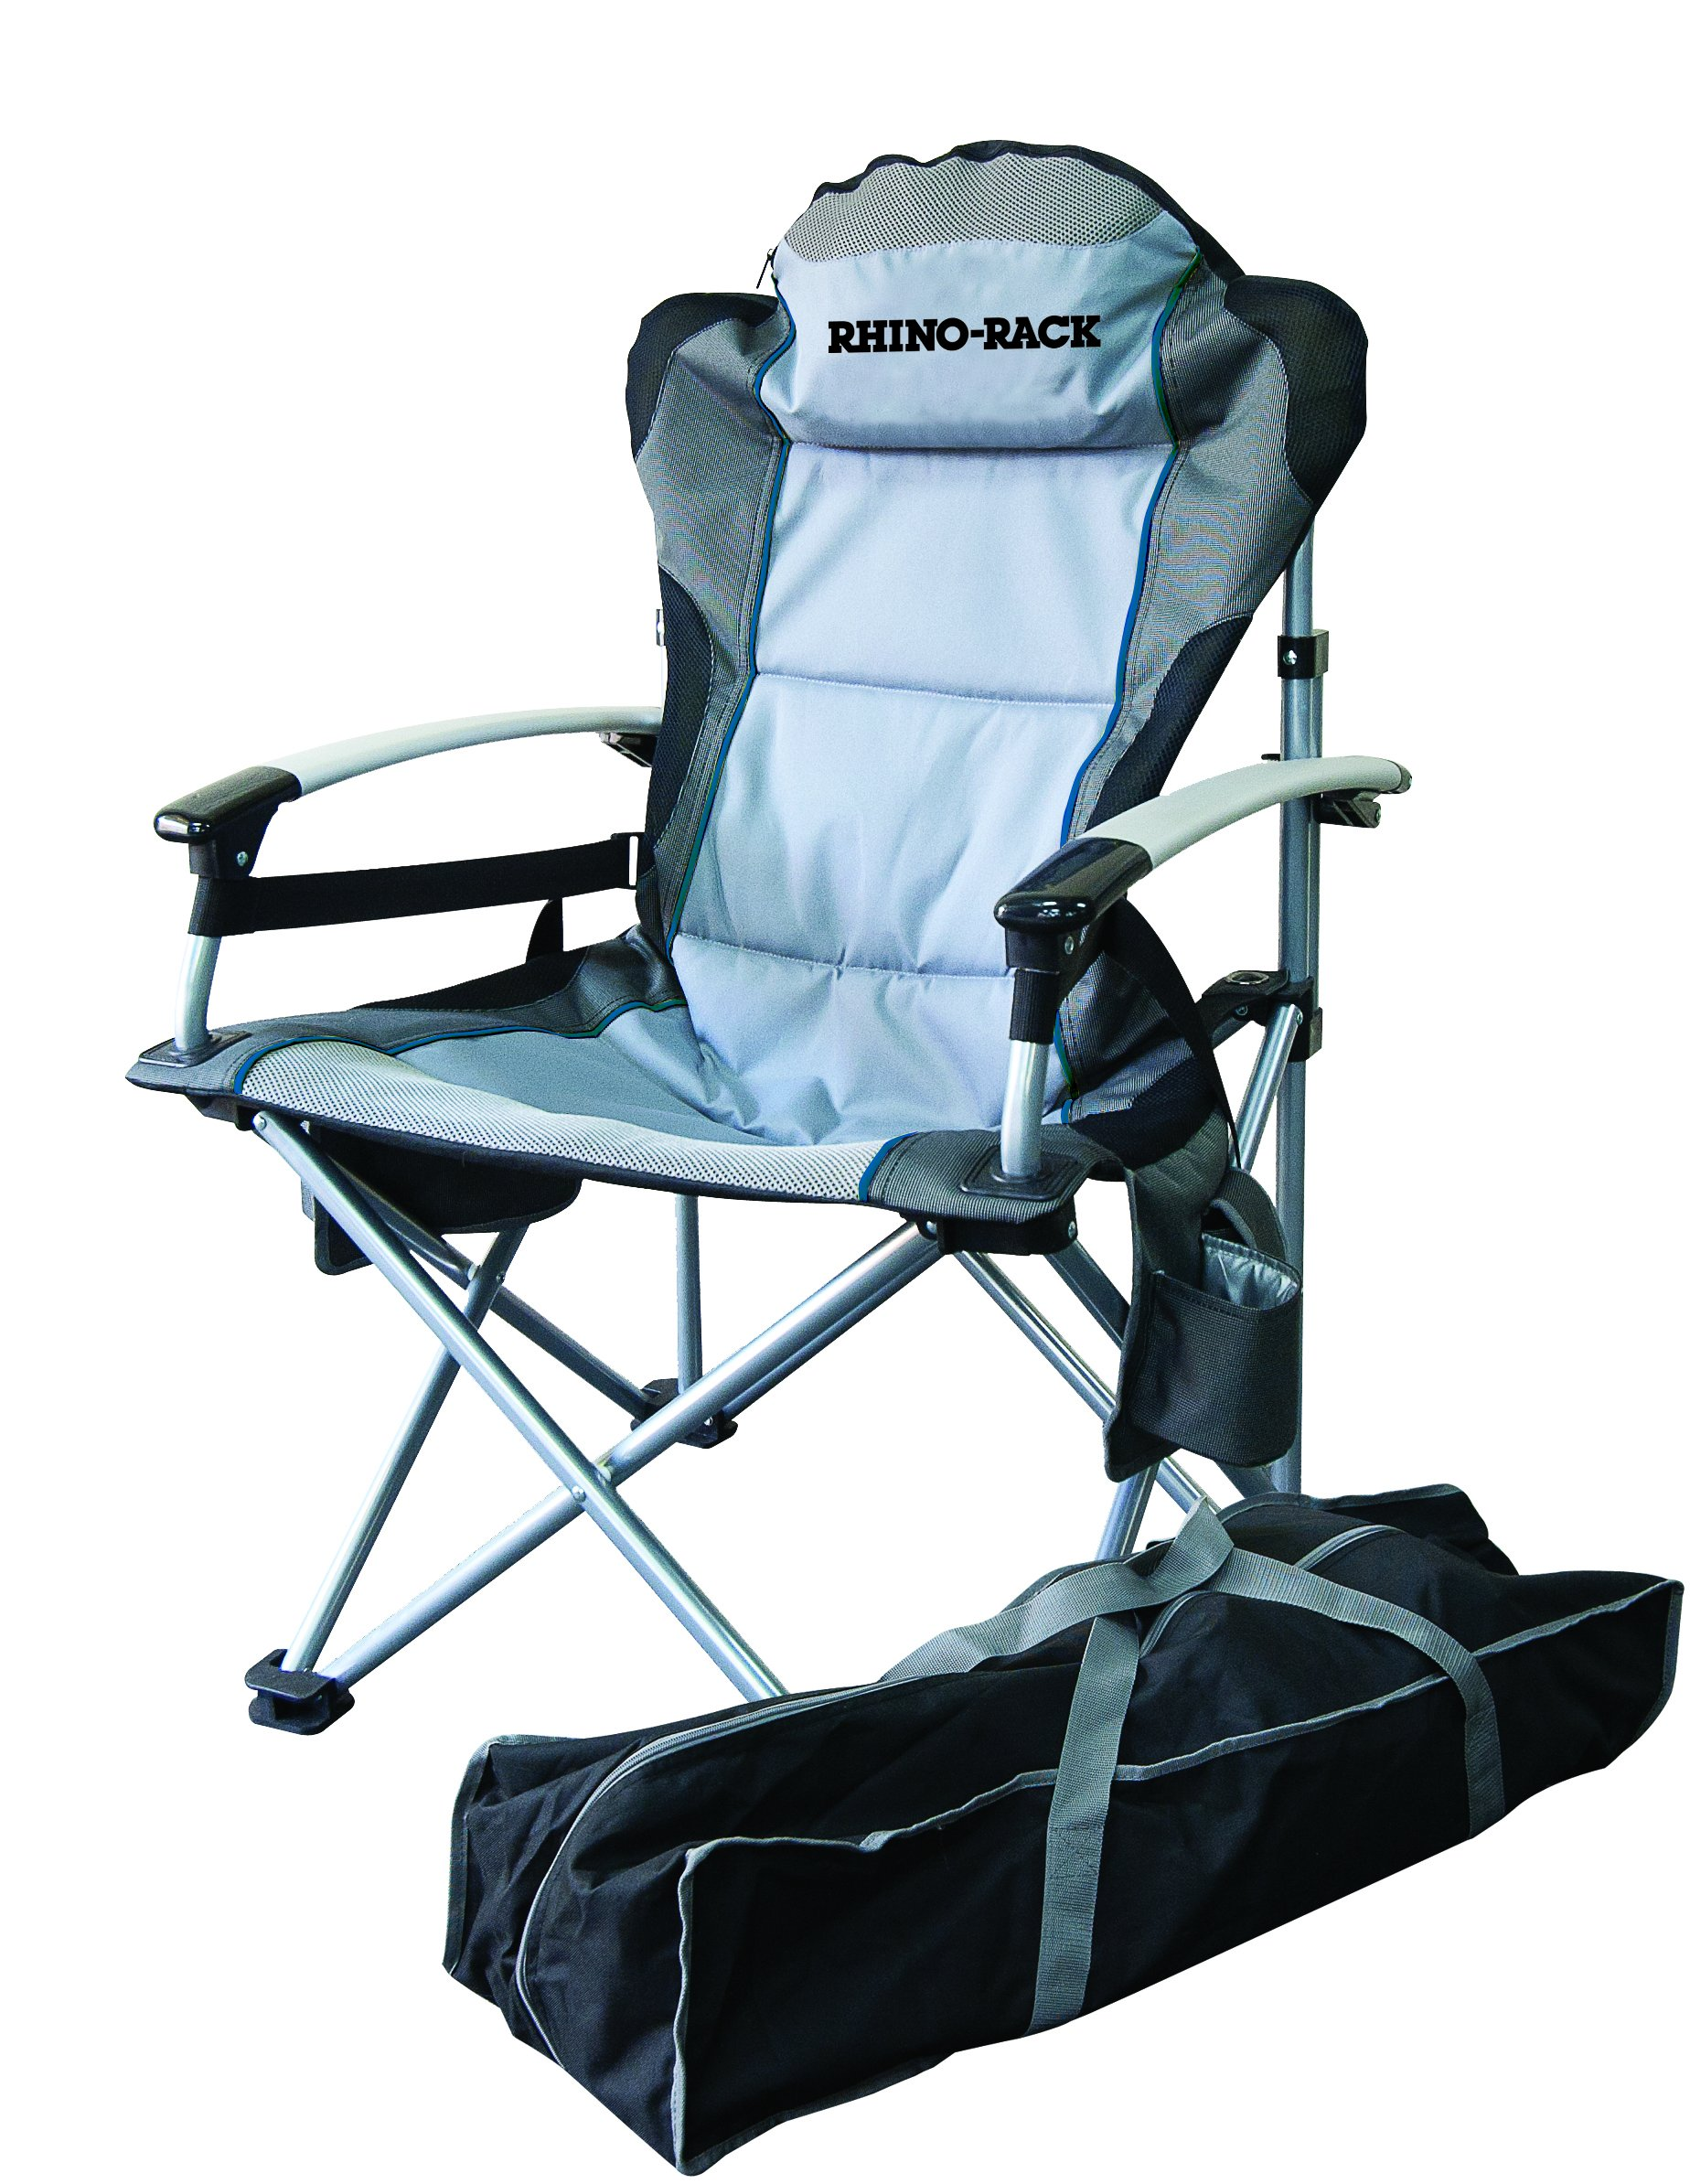 Rhino-Rack RCC Camping Chair